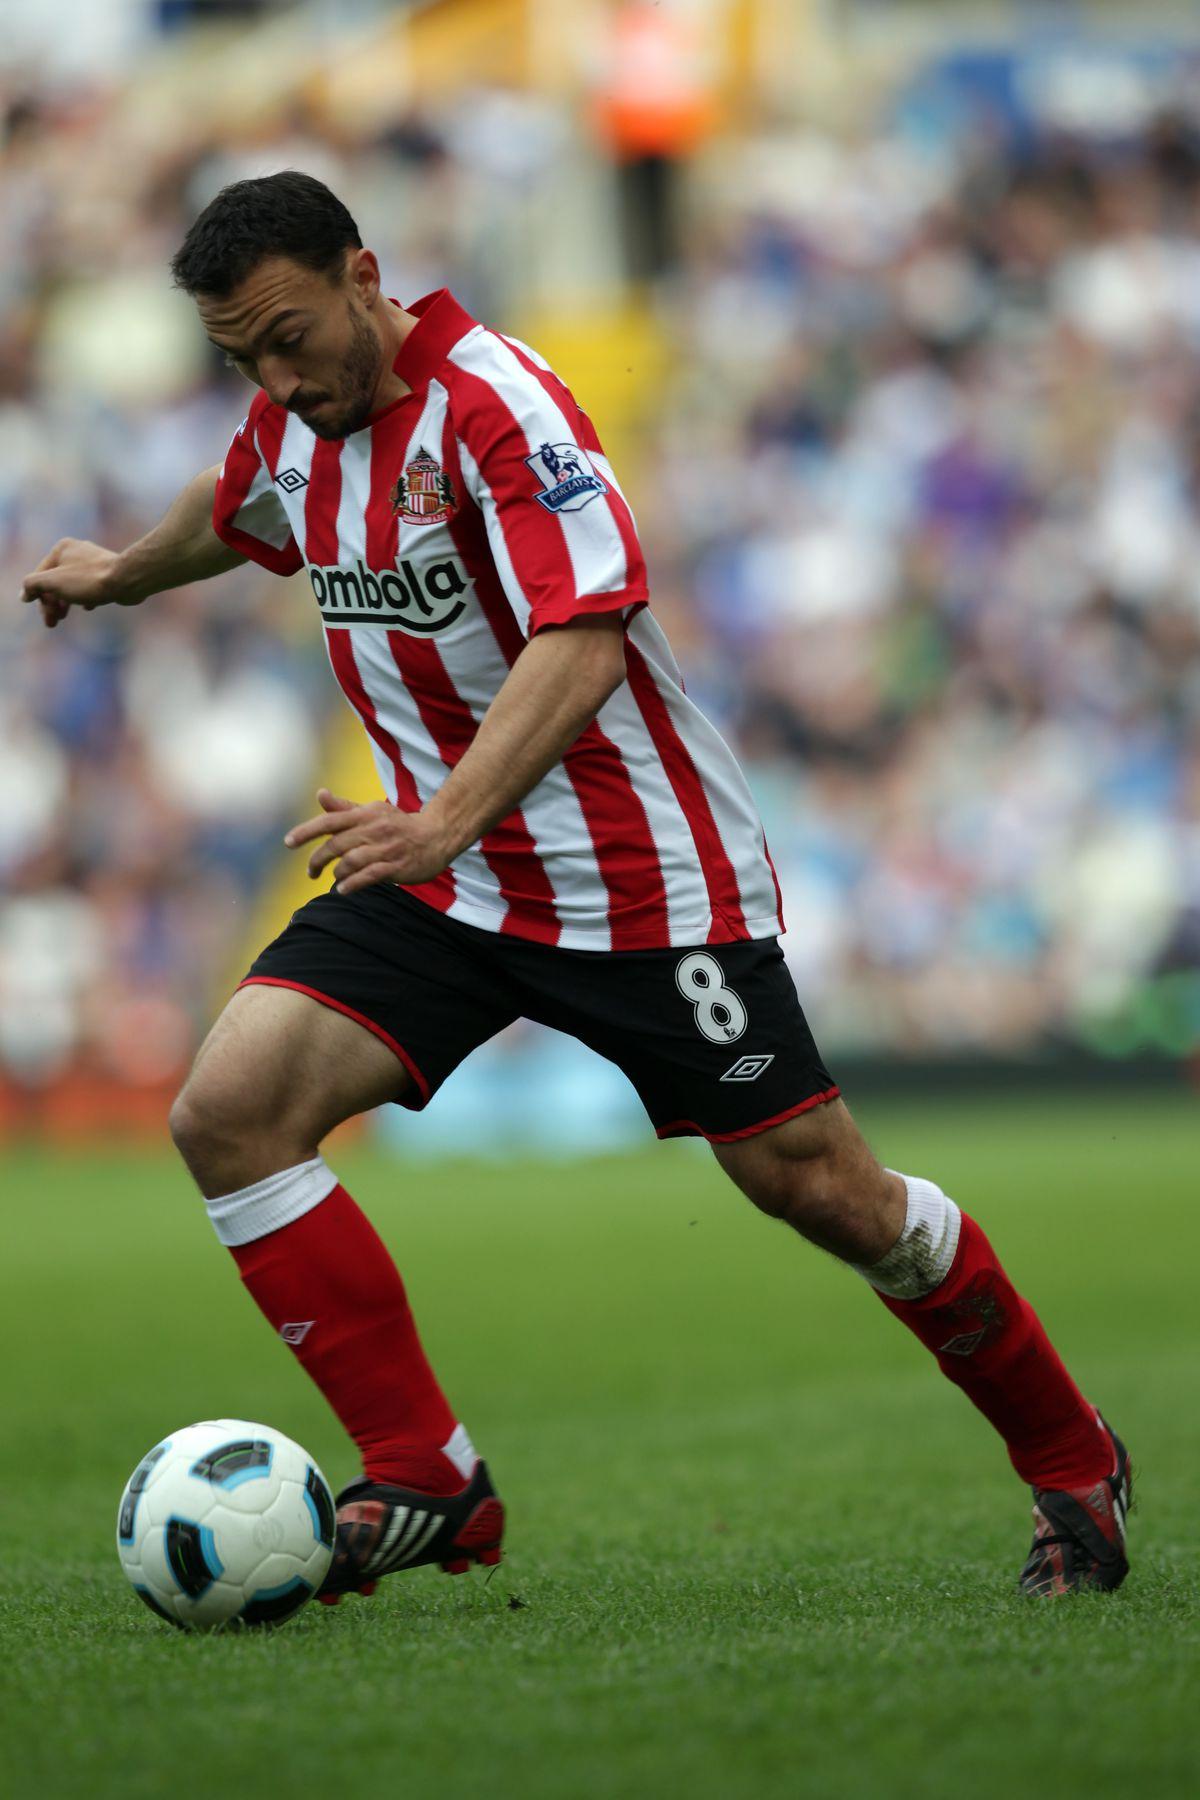 Birmingham City v Sunderland - Premier League